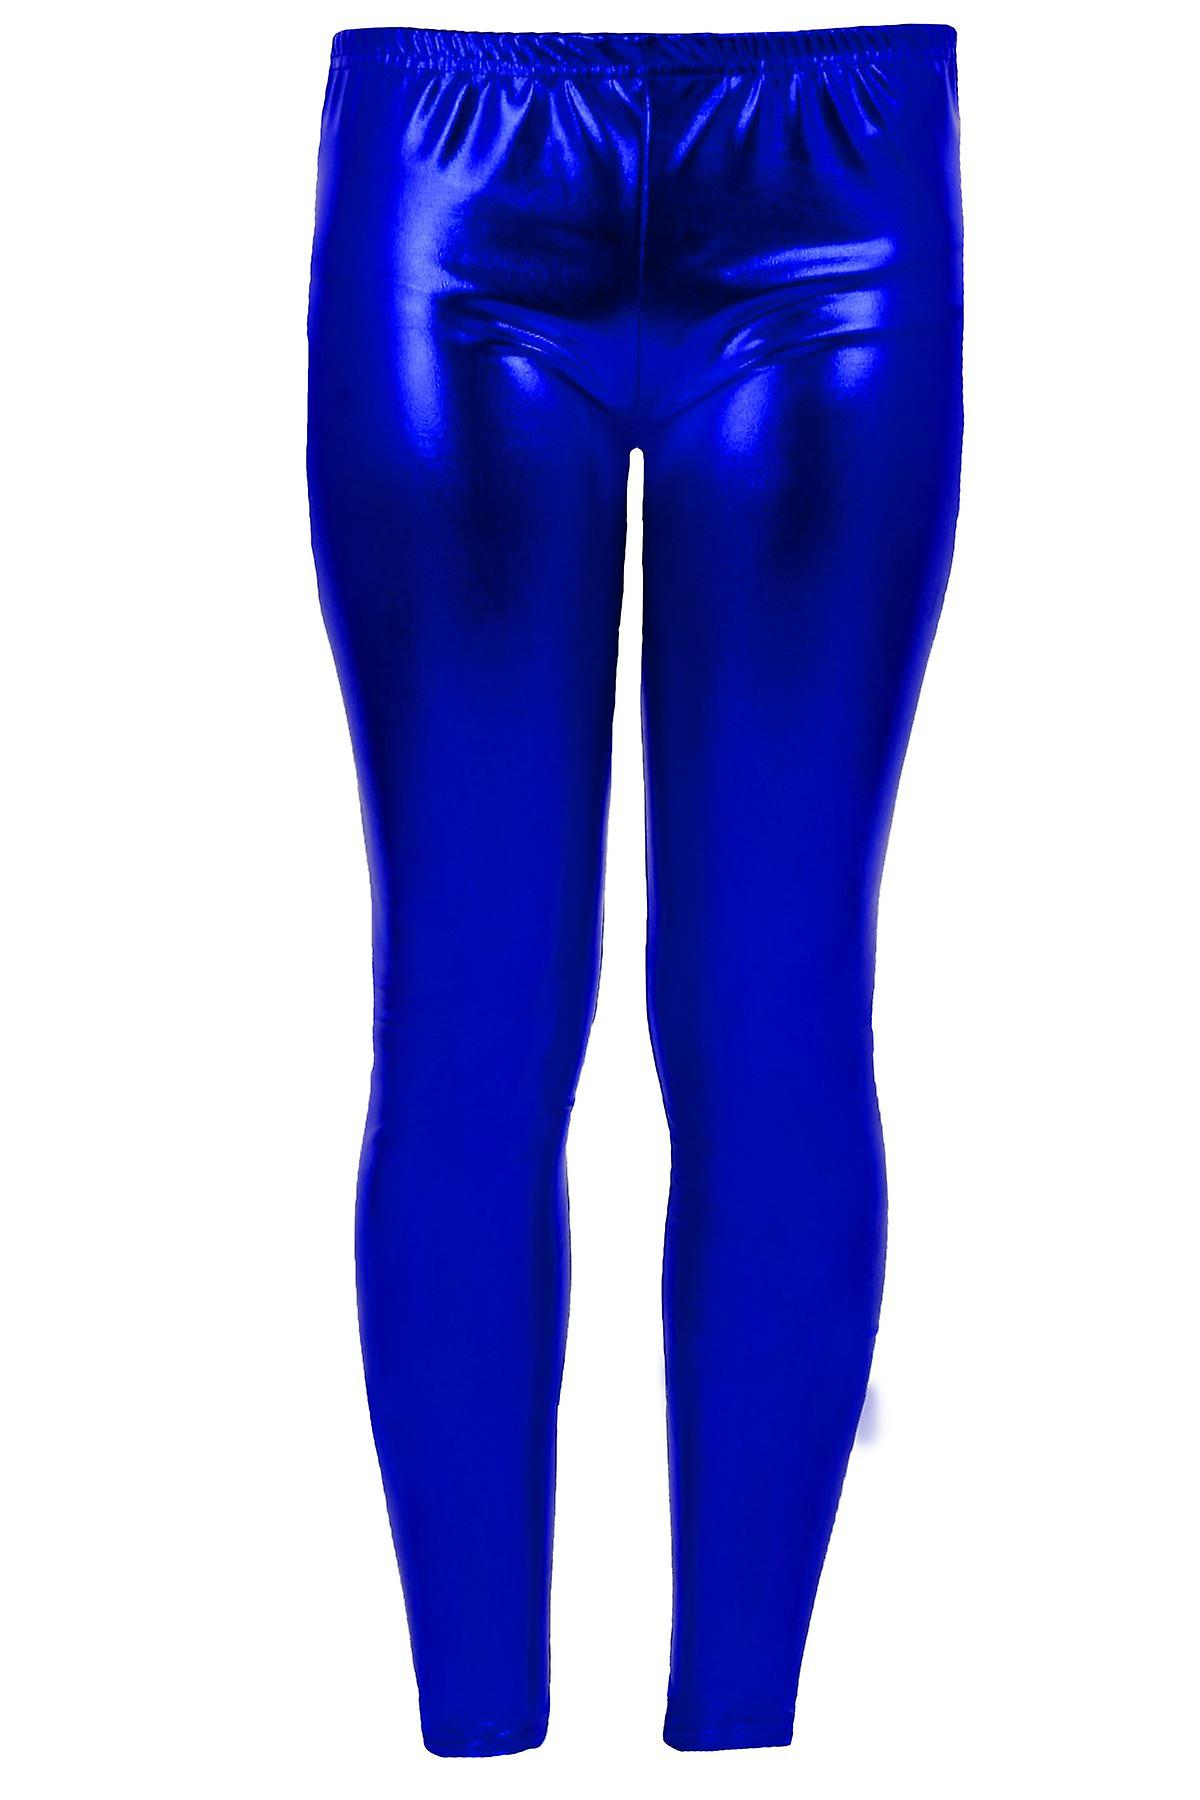 711861adf0d0f Girls Kid's Metallic Shiny Children's Wet Look Footless Party Disco Pants  Leggings